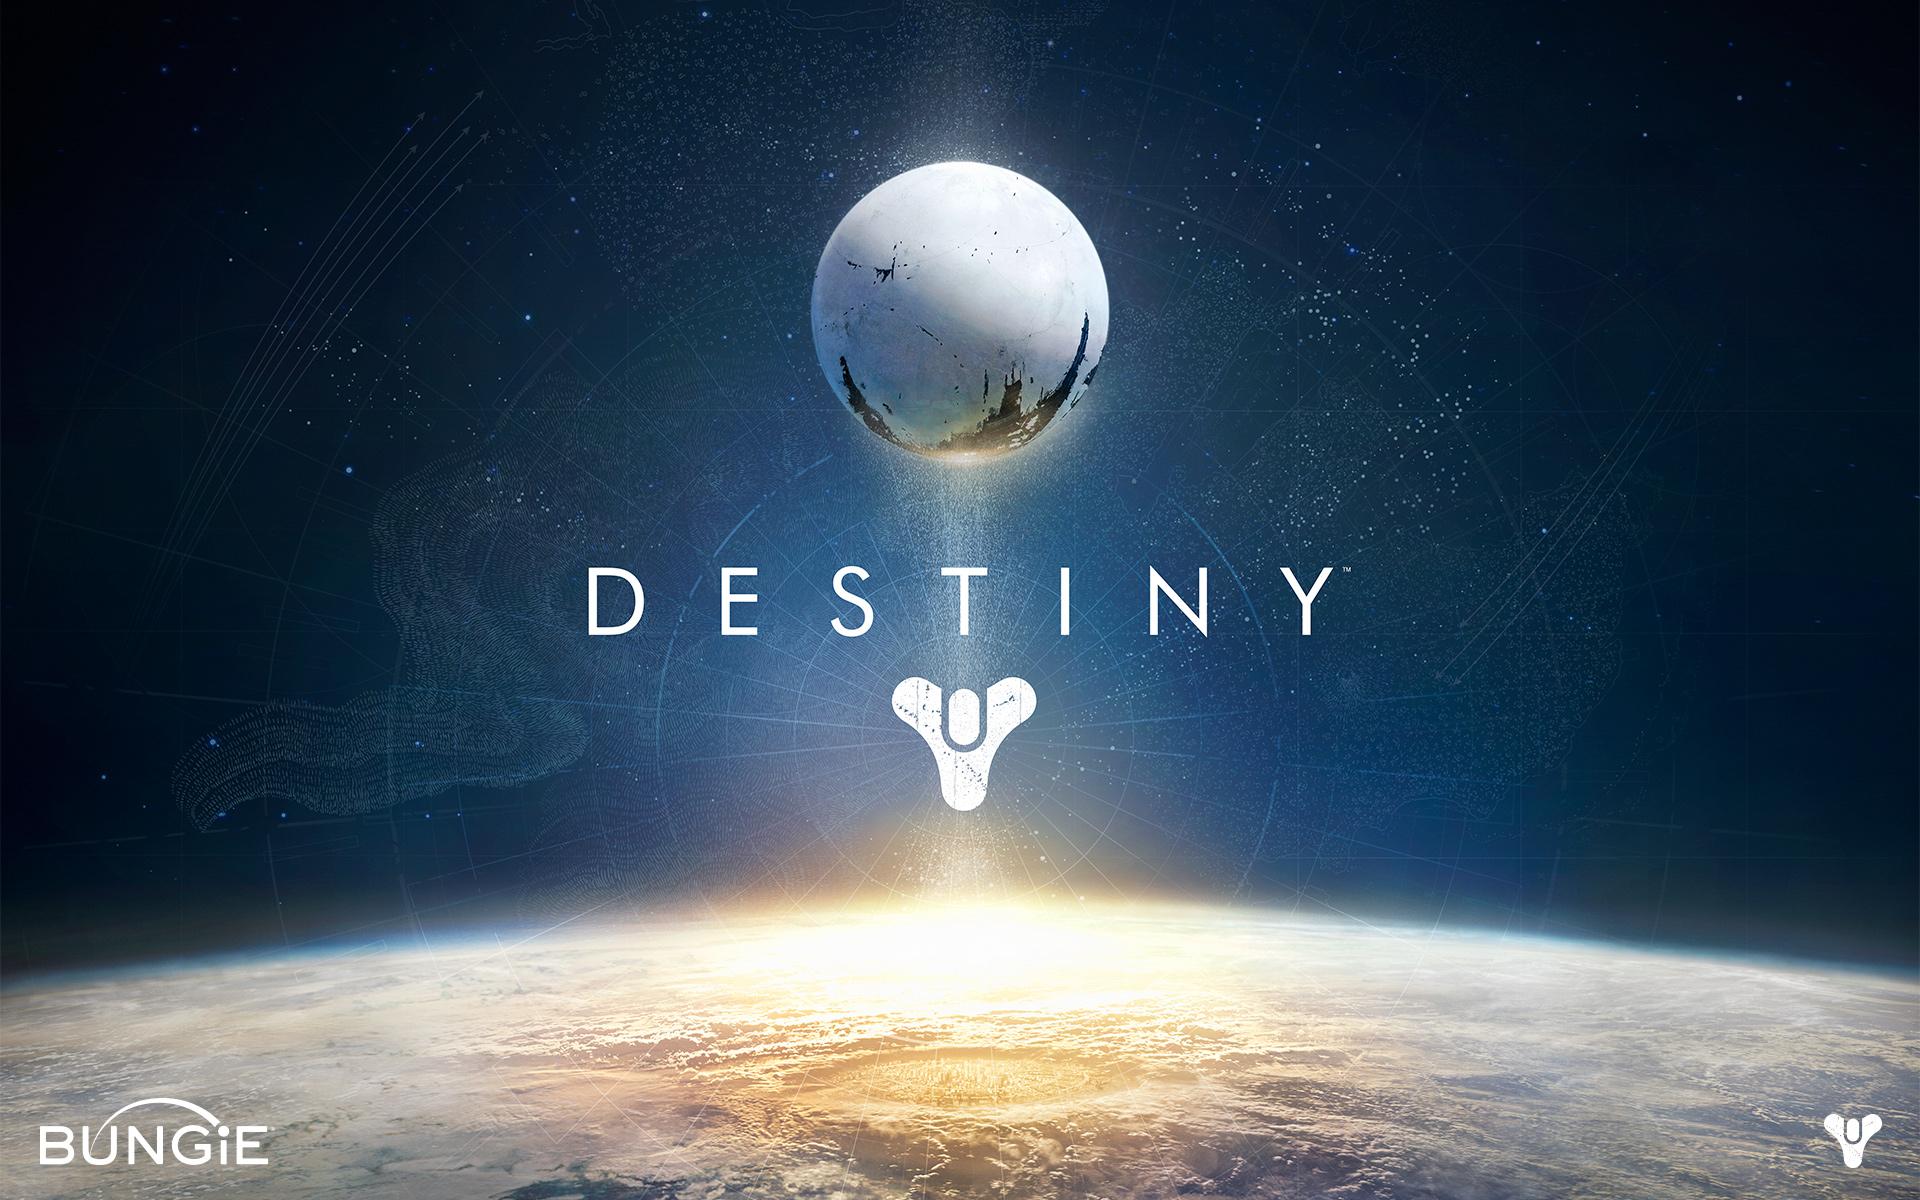 Bungie Reveals Destiny's PlayStation 4 Box Art